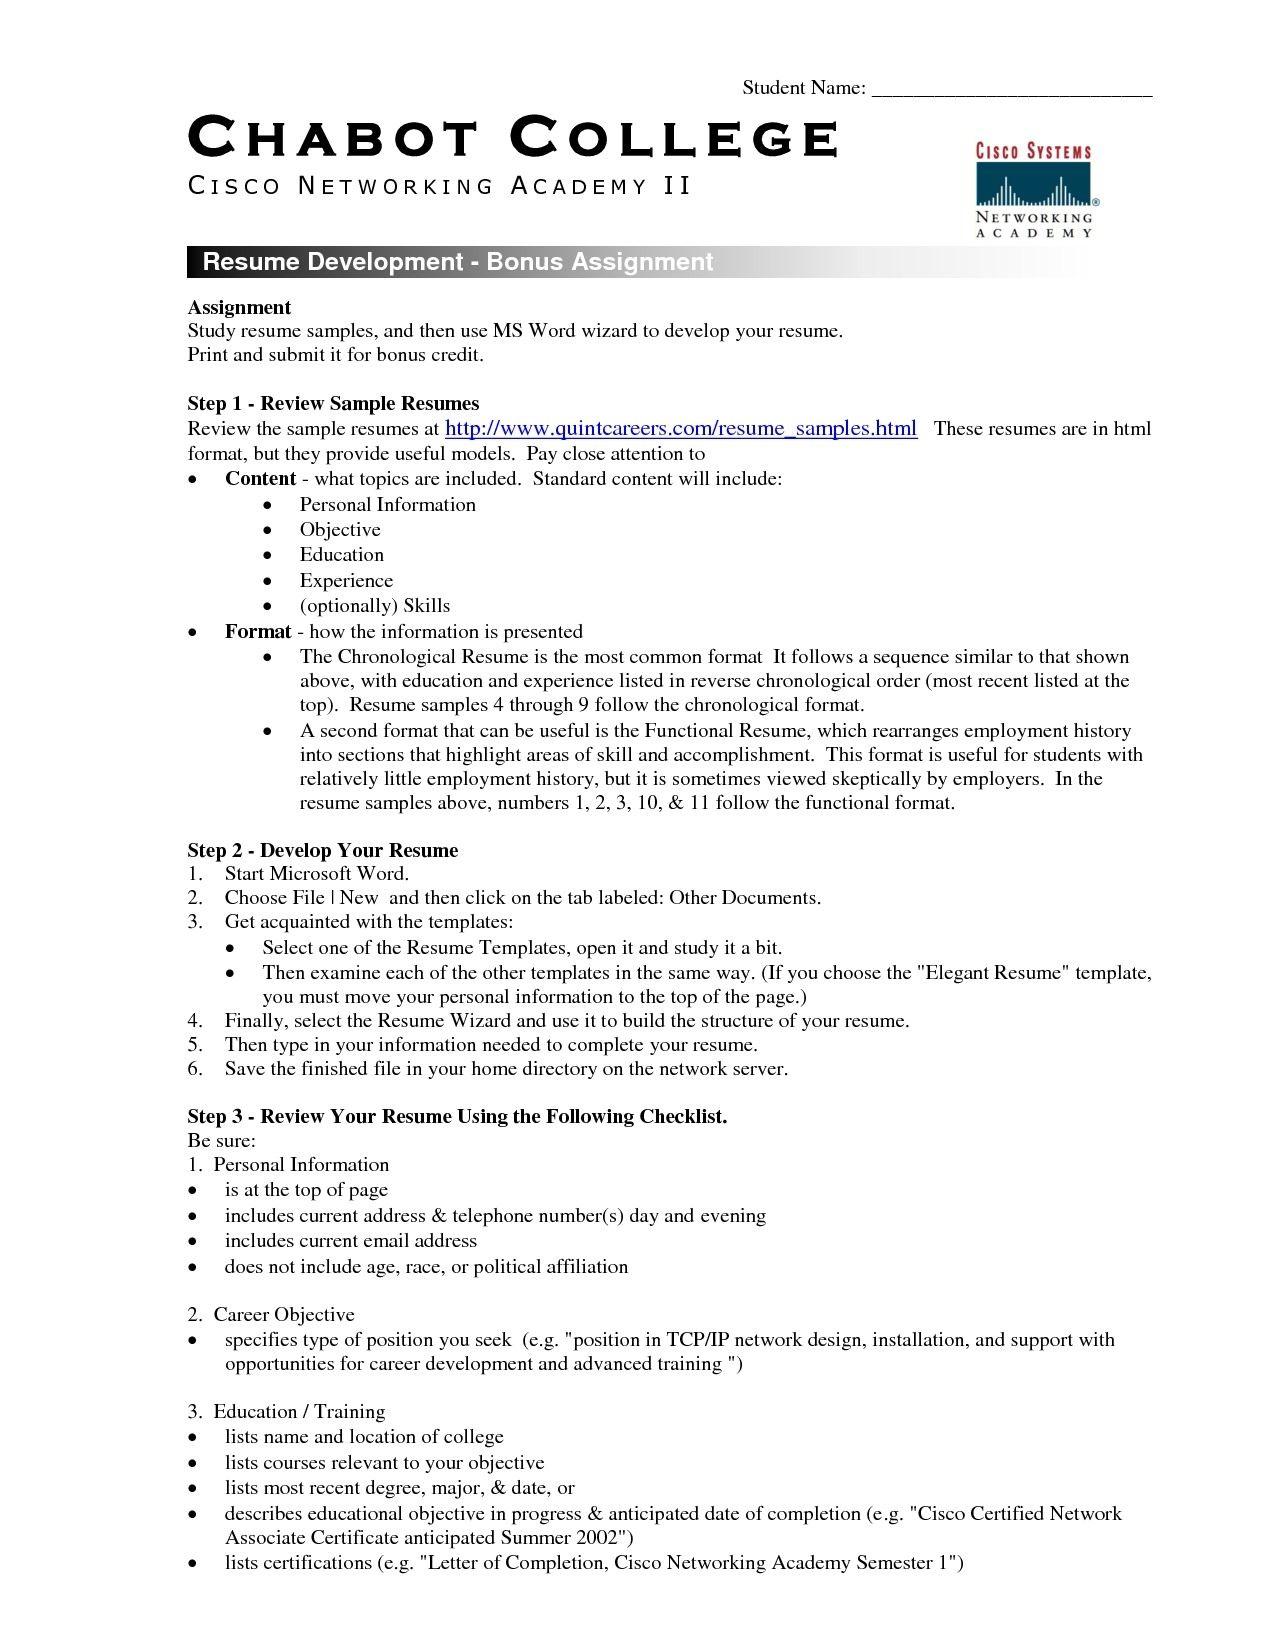 2017 Reddit Student resume template, Microsoft word